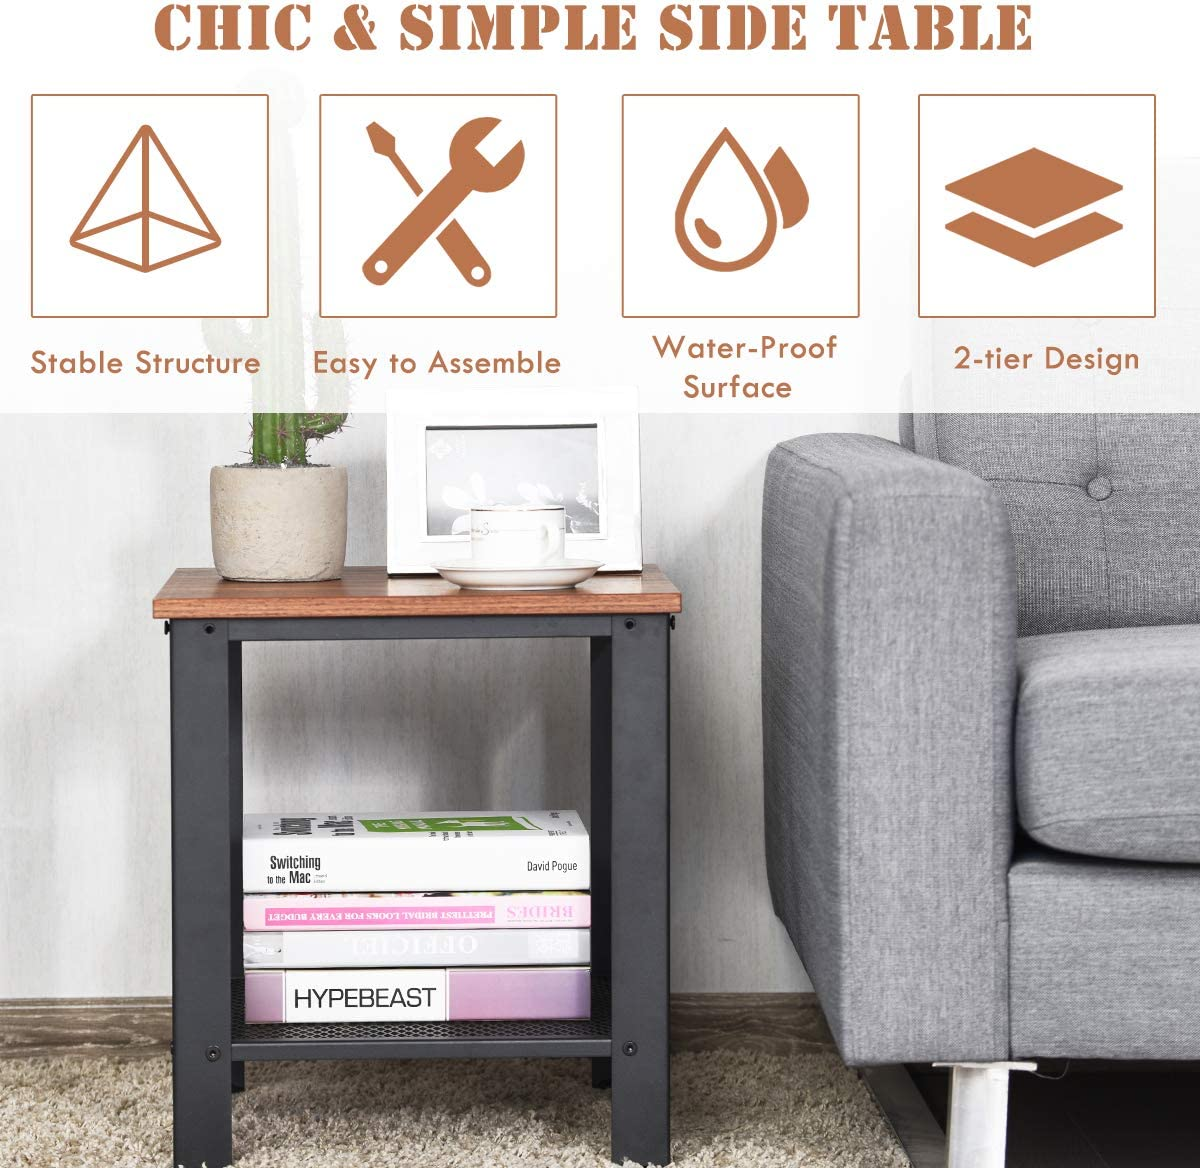 Giantex Nightstand Side Table 2-Tier W Adjustable Feet